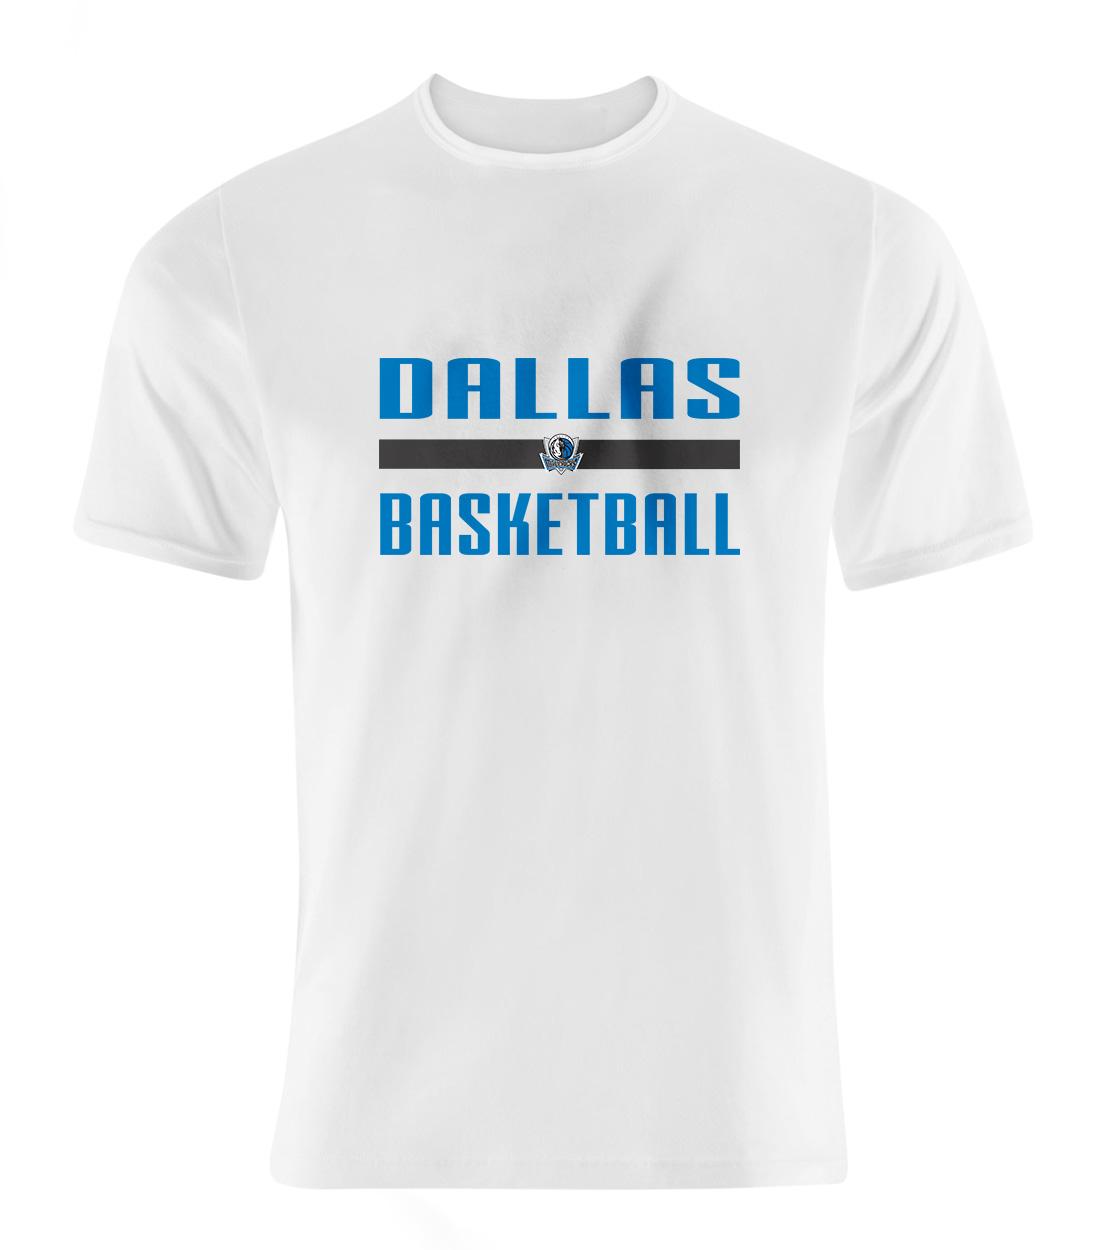 Dallas Basketball Tshirt (TSH-WHT-SKR-dlls-bsktbll-507)